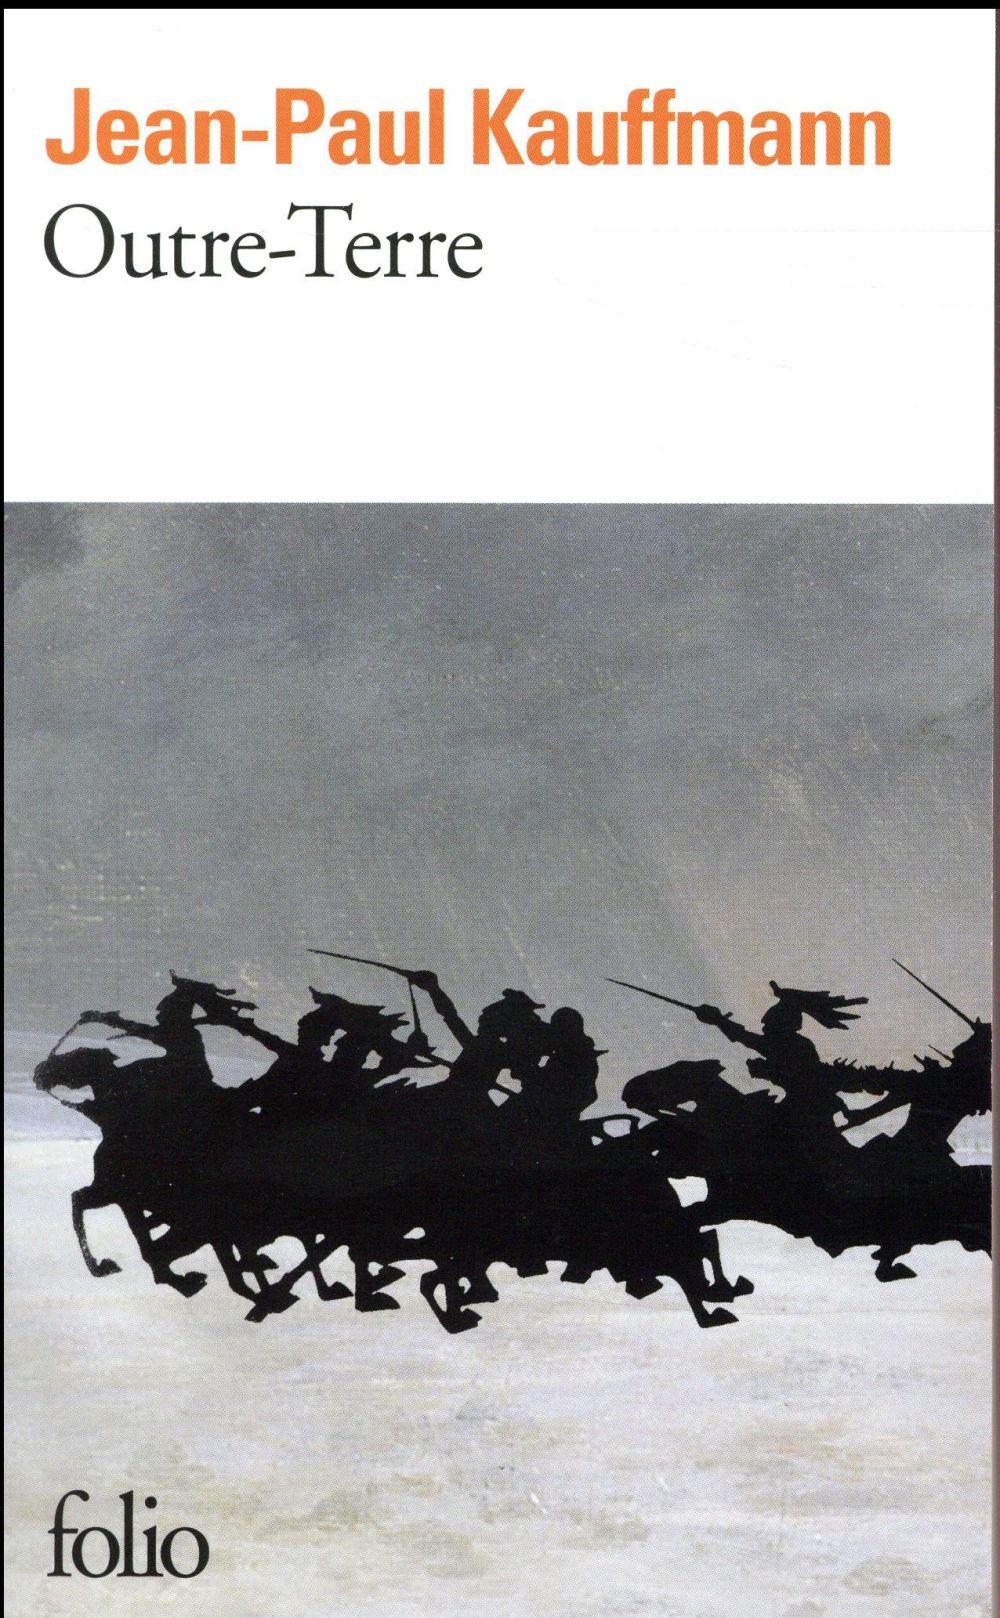 OUTRE-TERRE Kauffmann Jean-Paul Gallimard